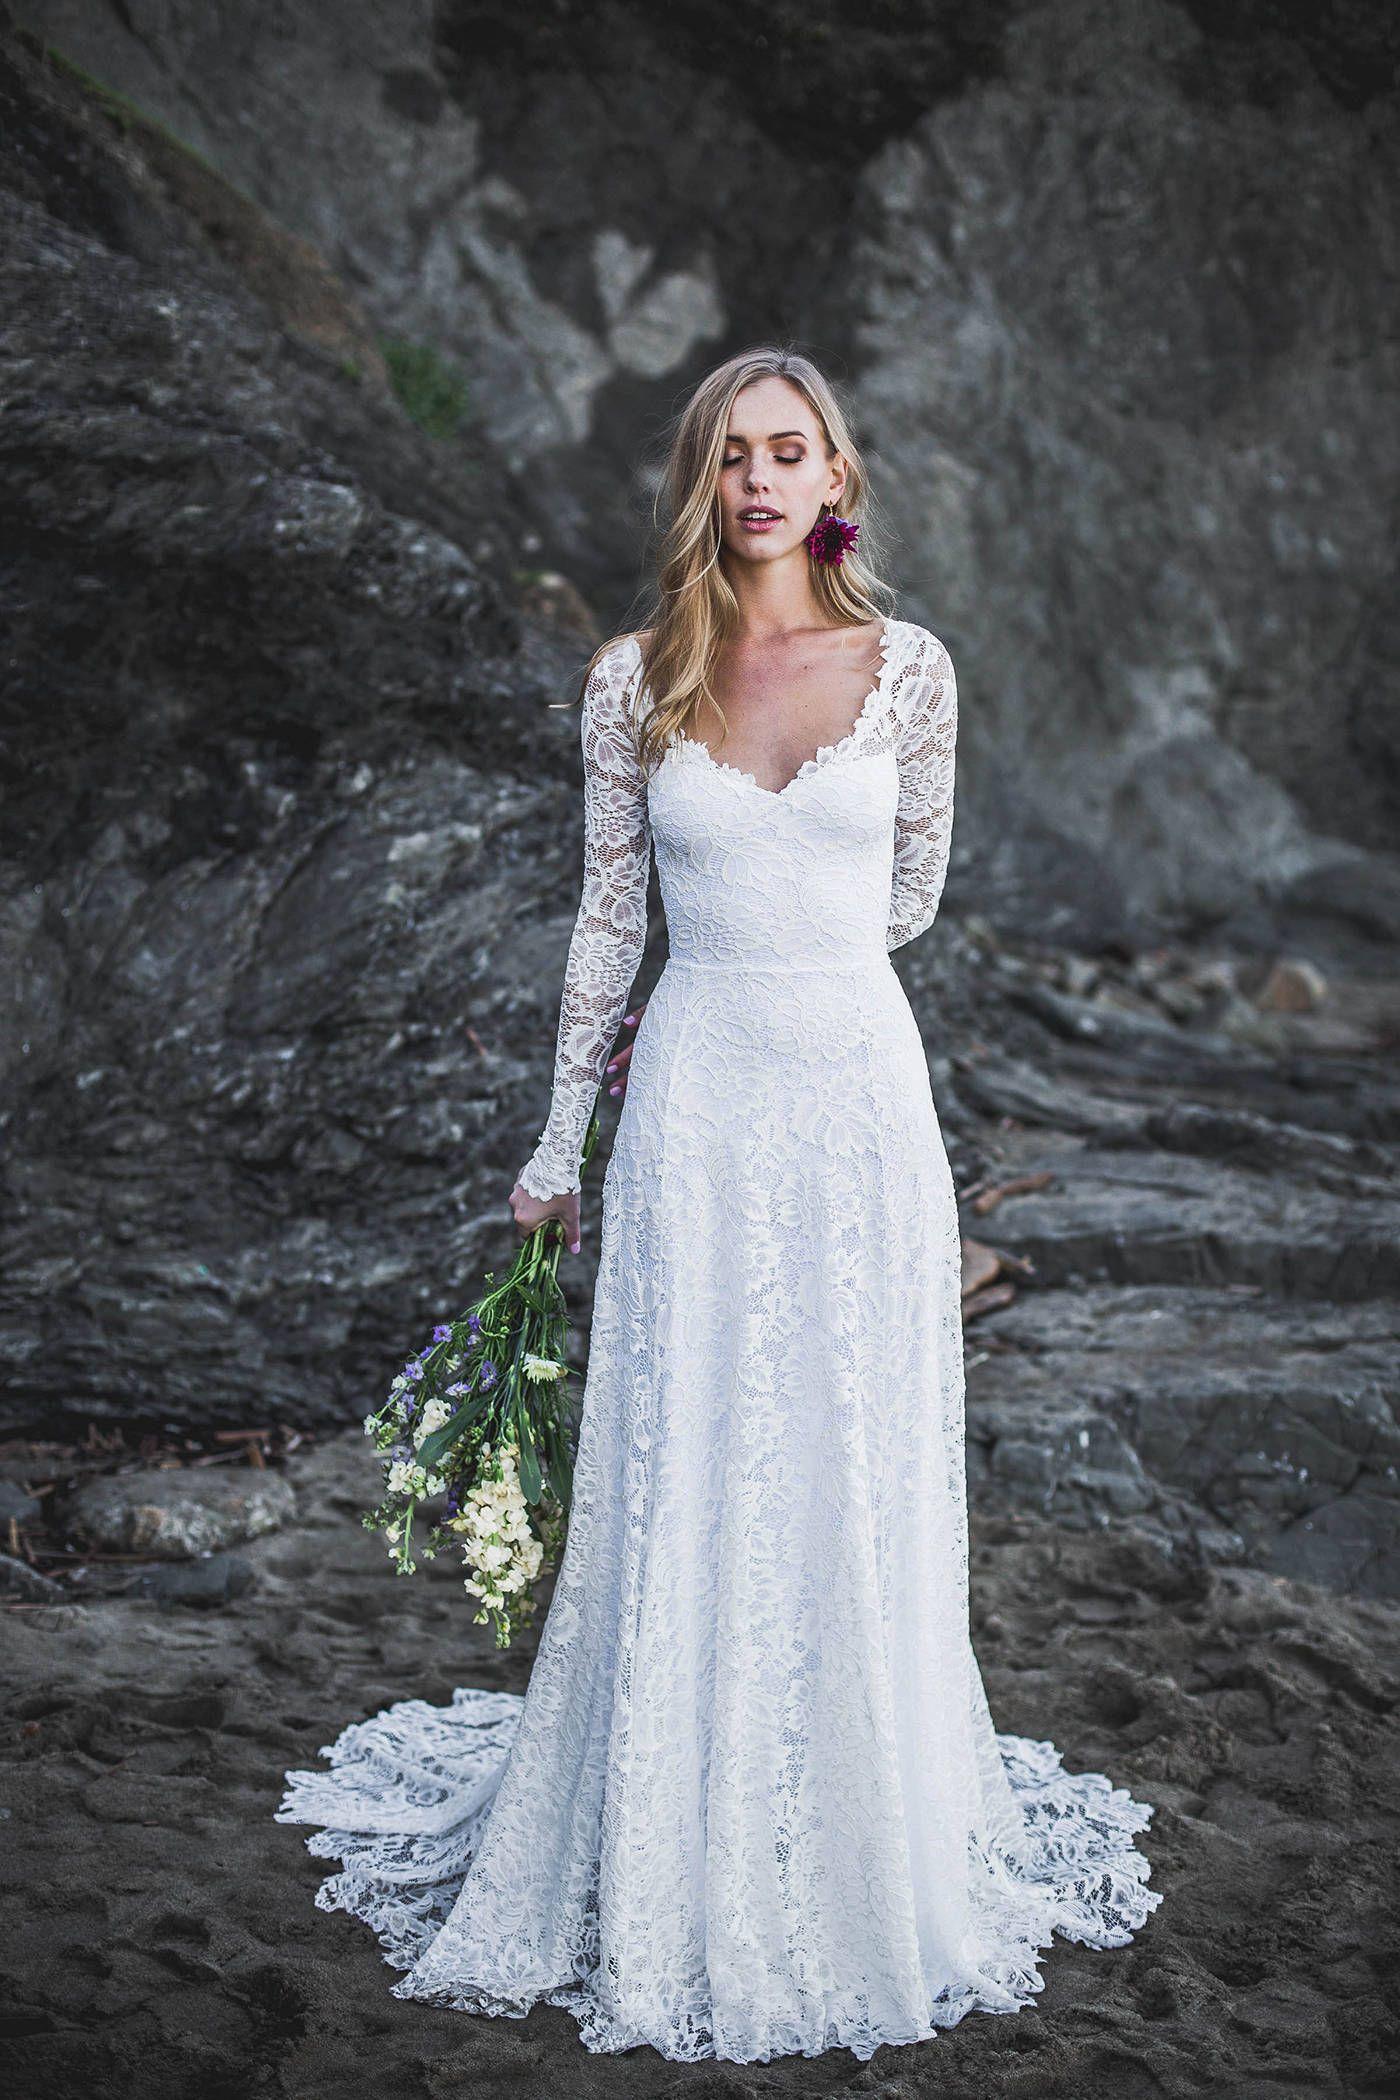 Wear Your Love Chic Vintage Brides Wedding Dresses Sweetheart Neckline Wedding Dresses Hippie Organic Wedding Dress